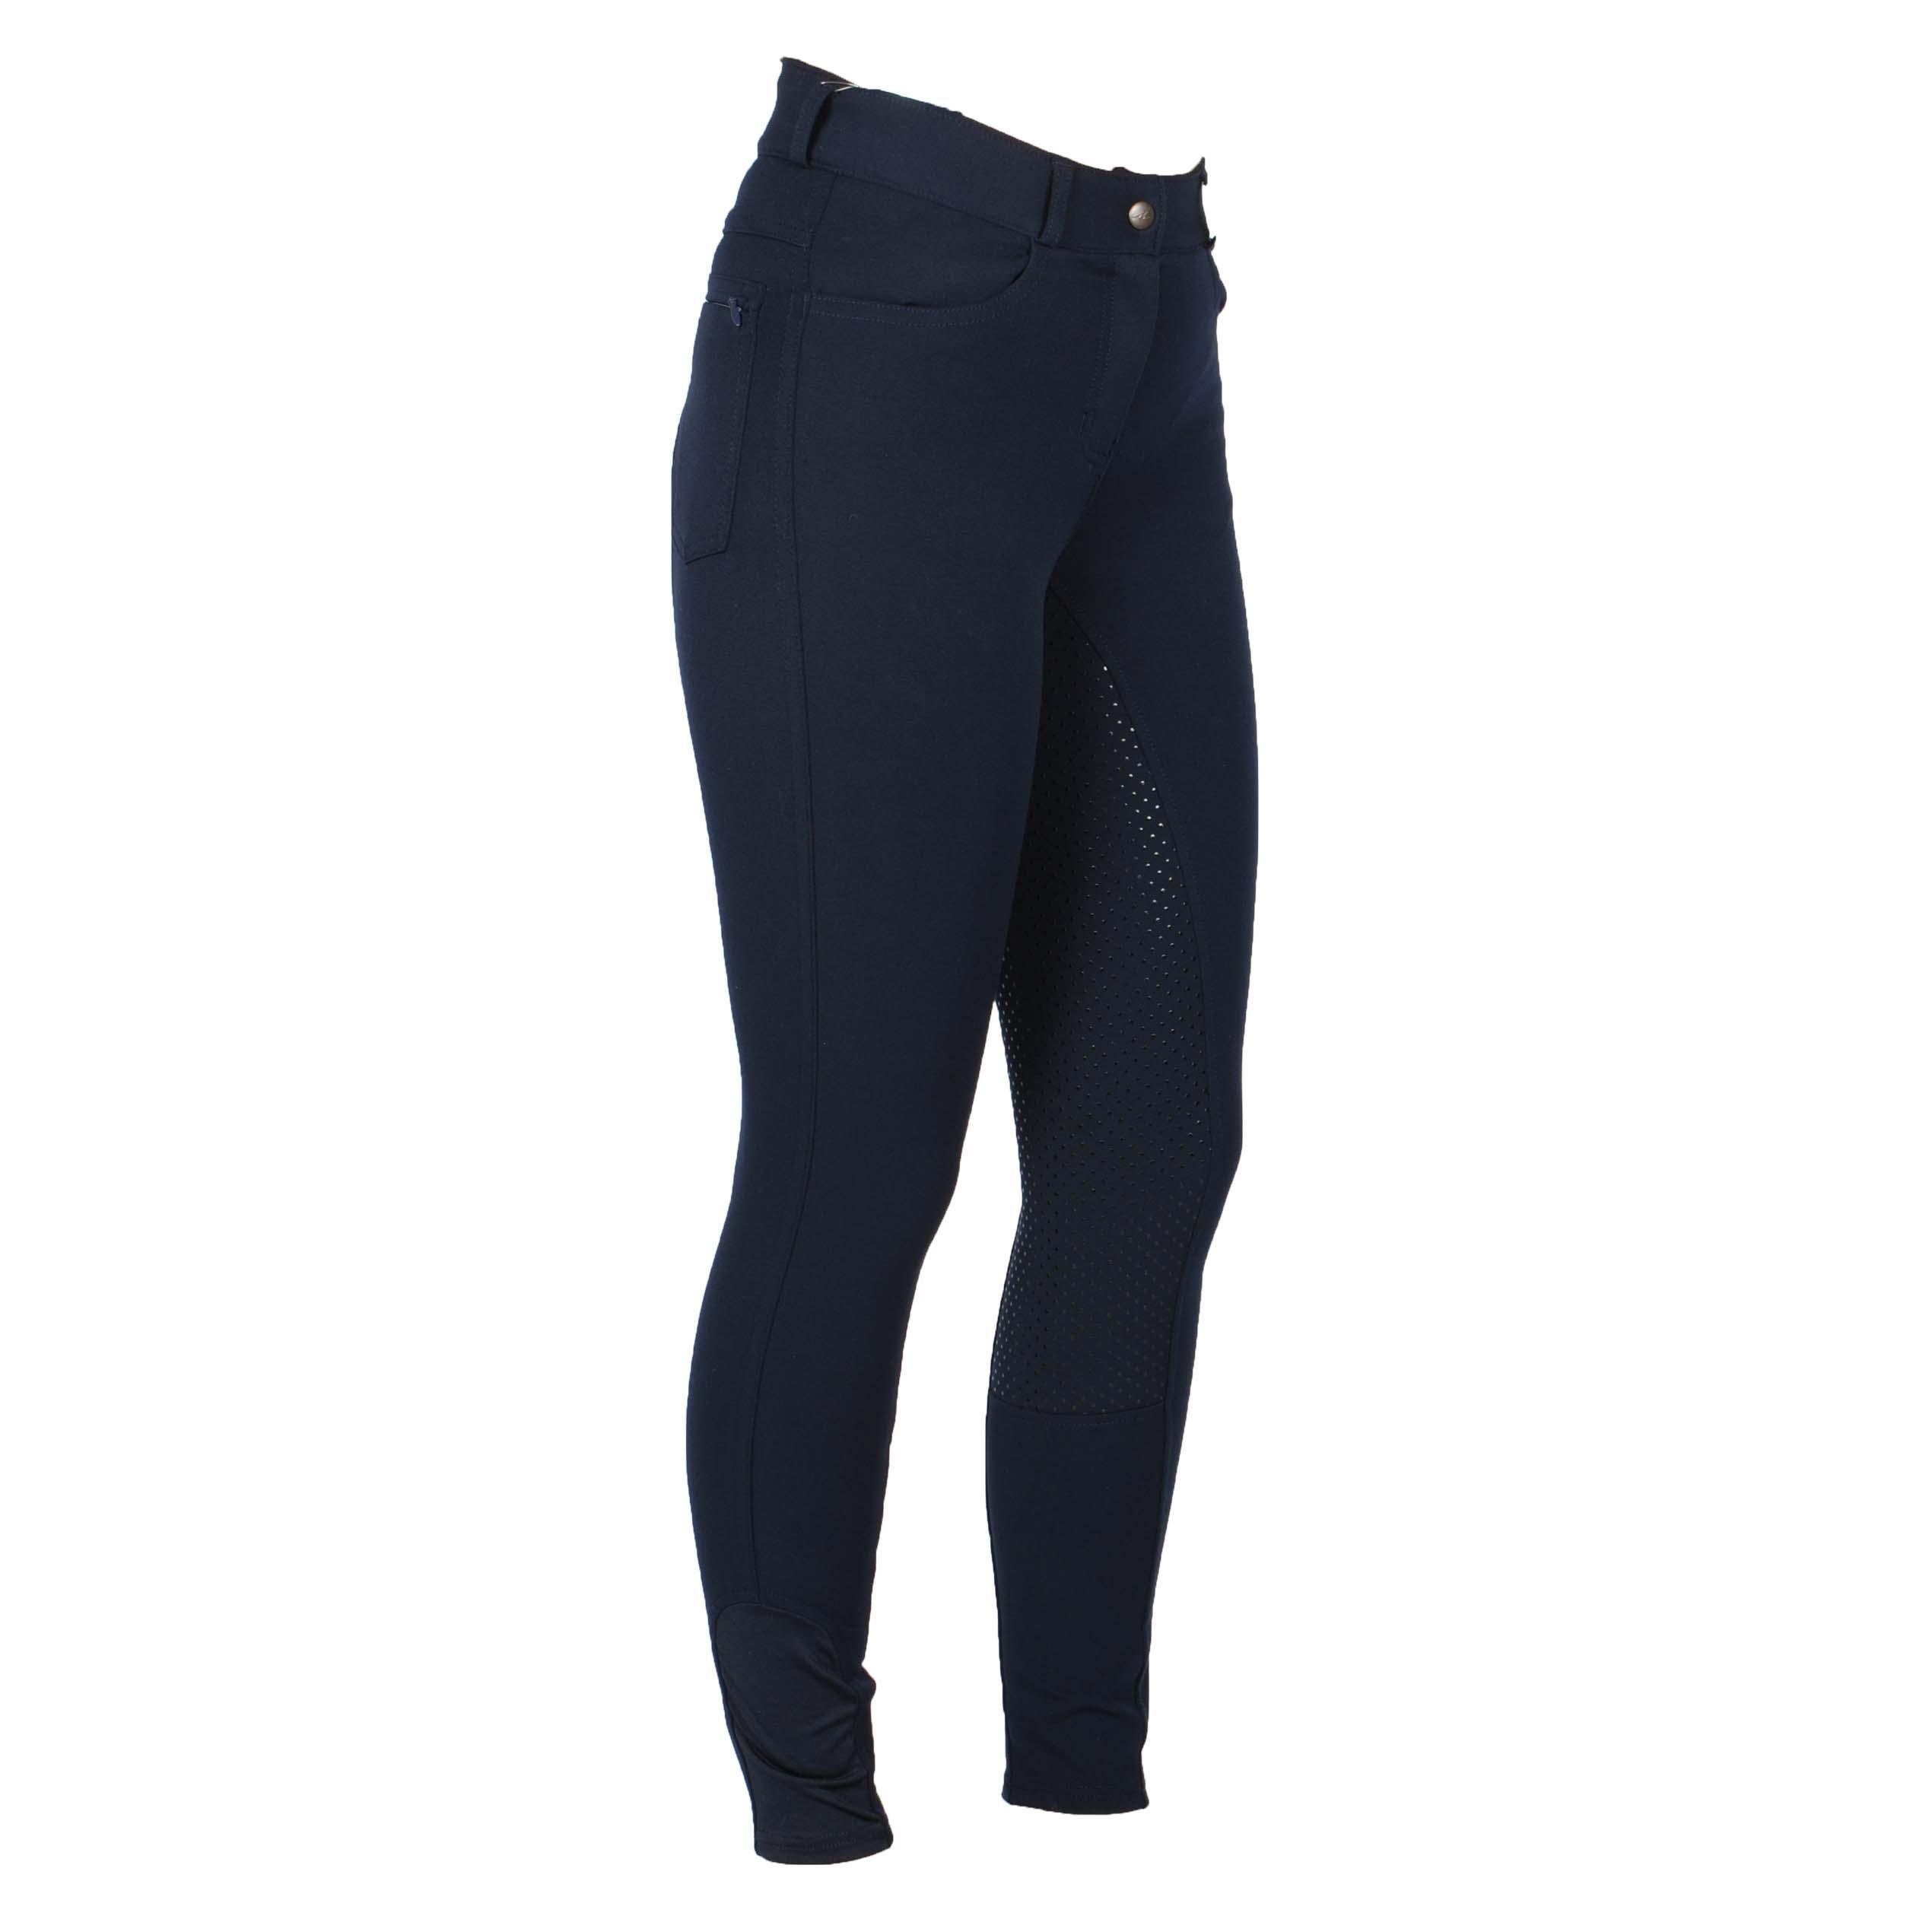 Mondoni Sada high waist full grip rijbroek donkerblauw maat:40